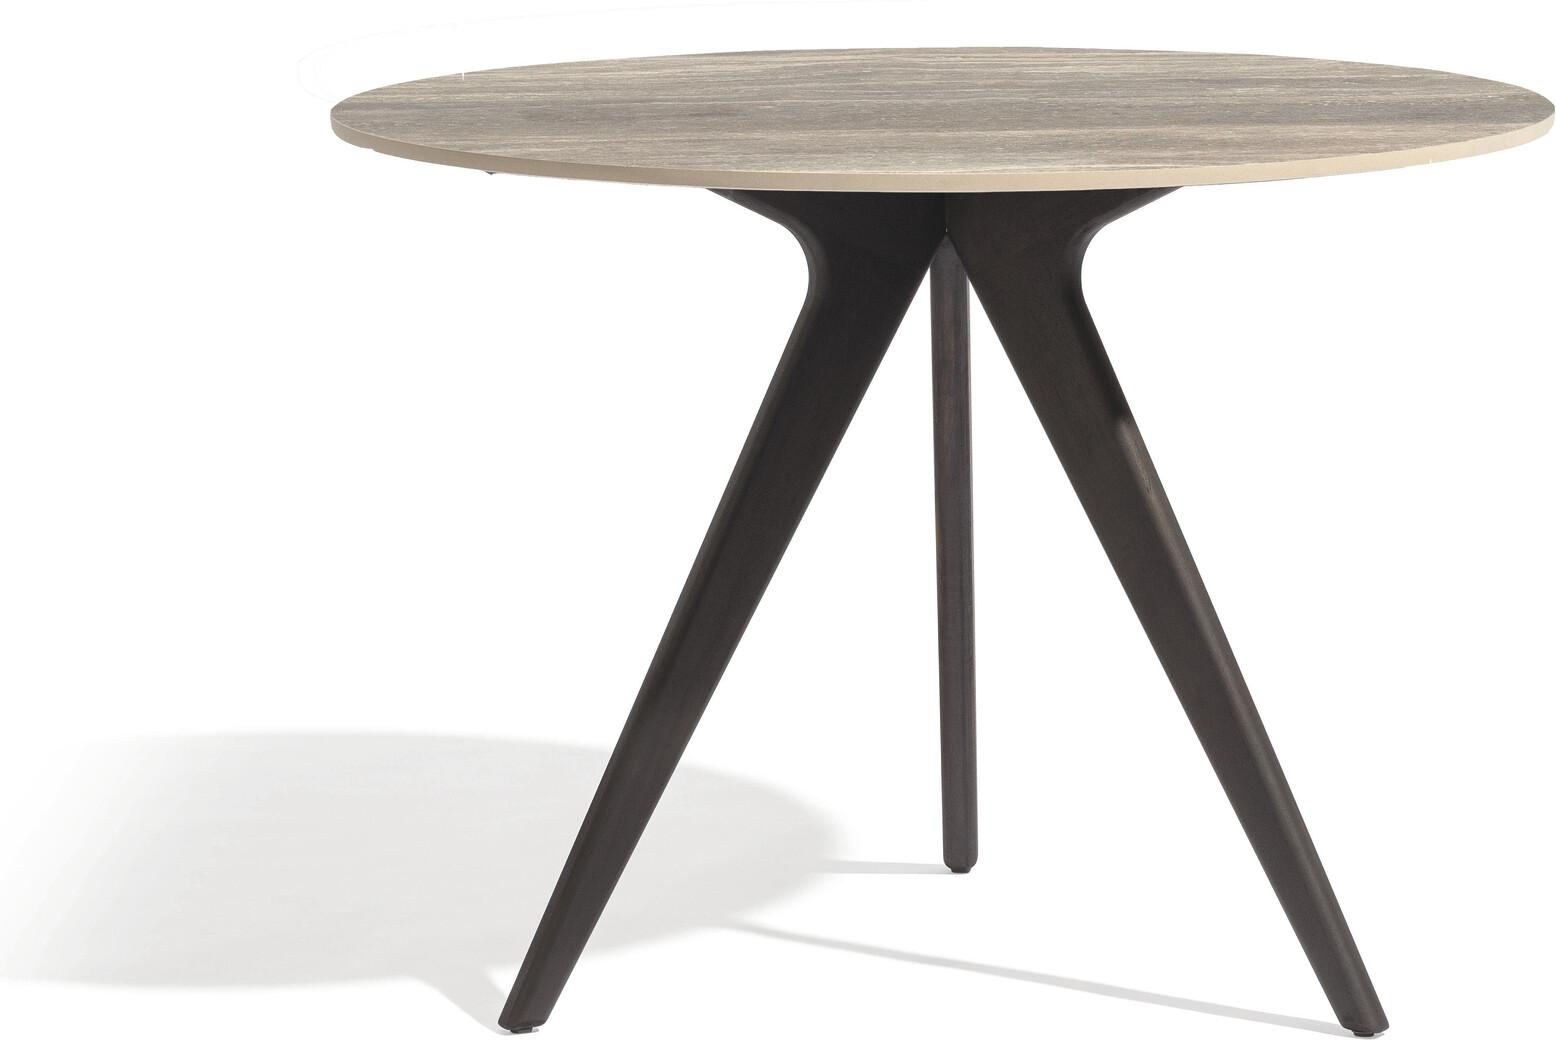 Torsa Dining table - Teak nero - CET 125